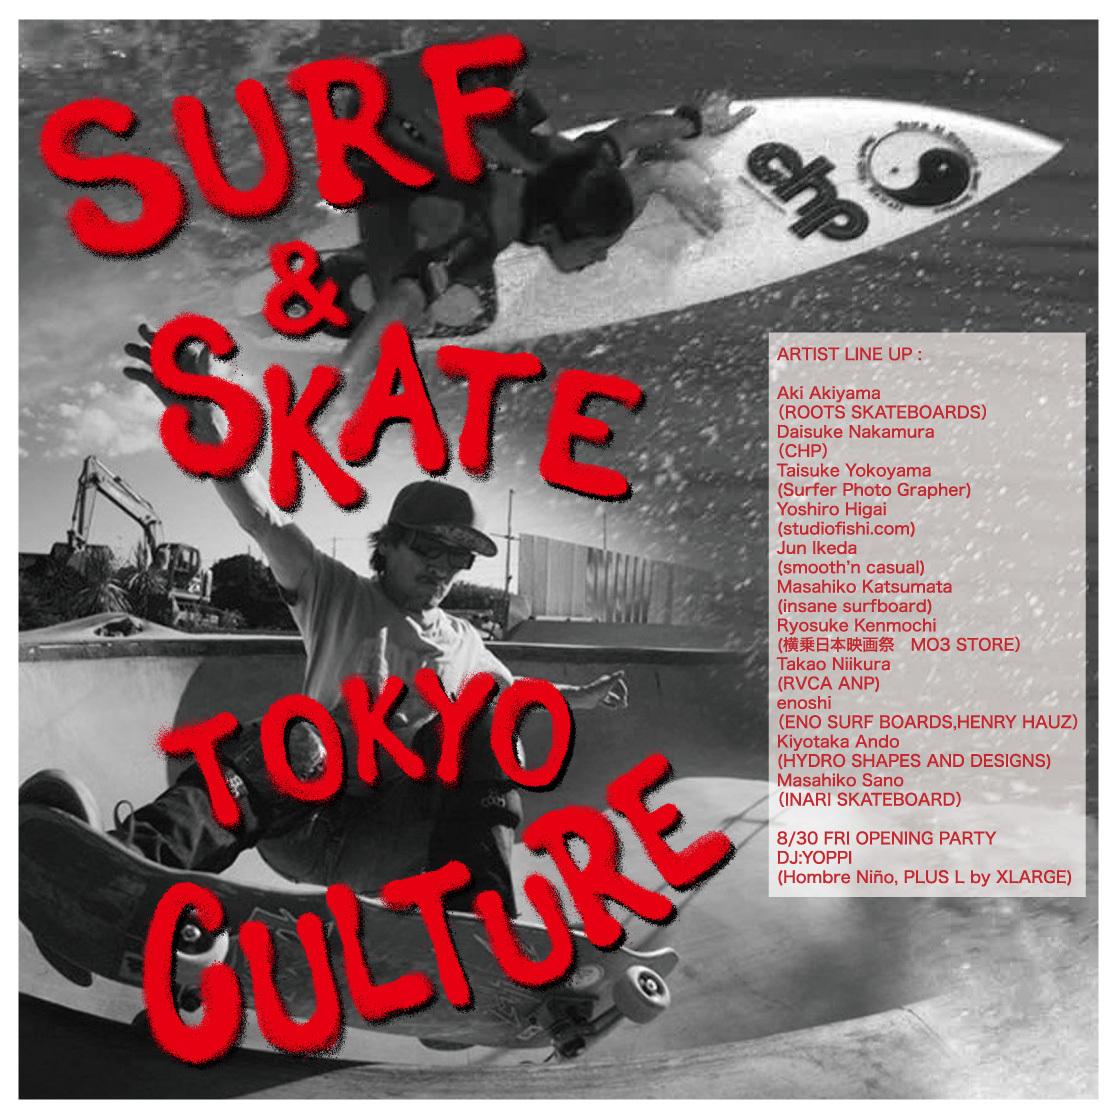 SURF-SKATE-TOKYO-CULTURE-Insta_1080x1080_2_ol.jpg